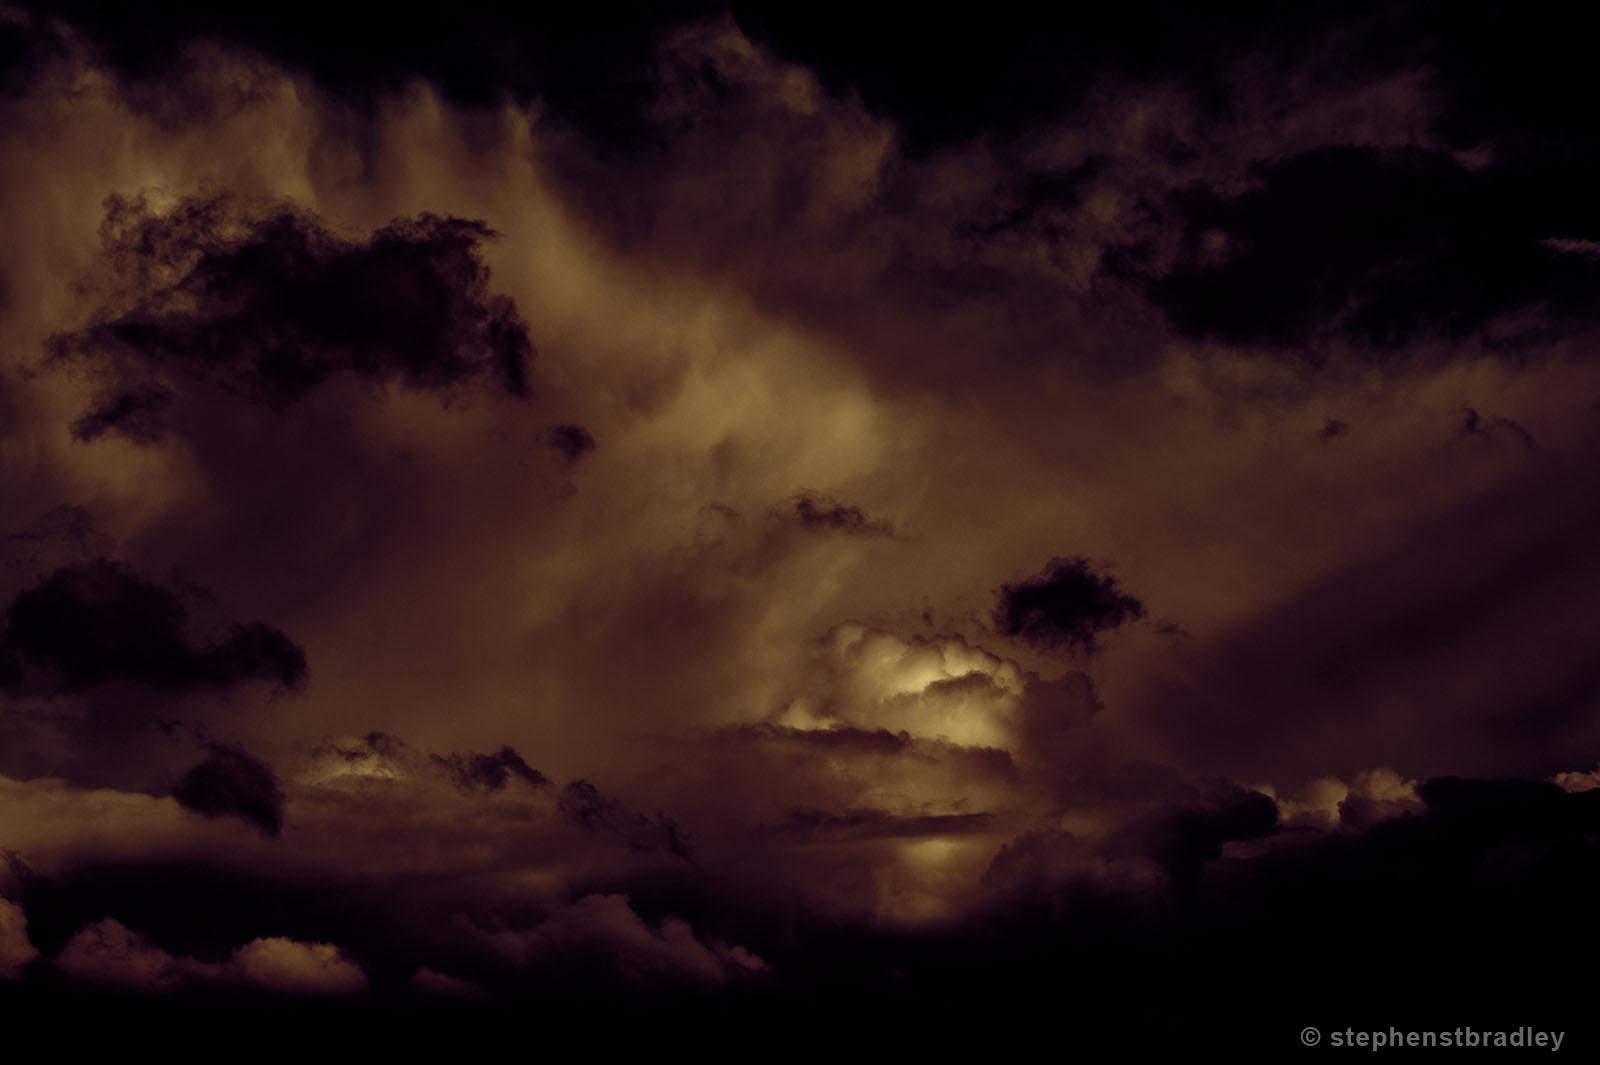 Boom - clouds over Newtownabbey, Northern Ireland